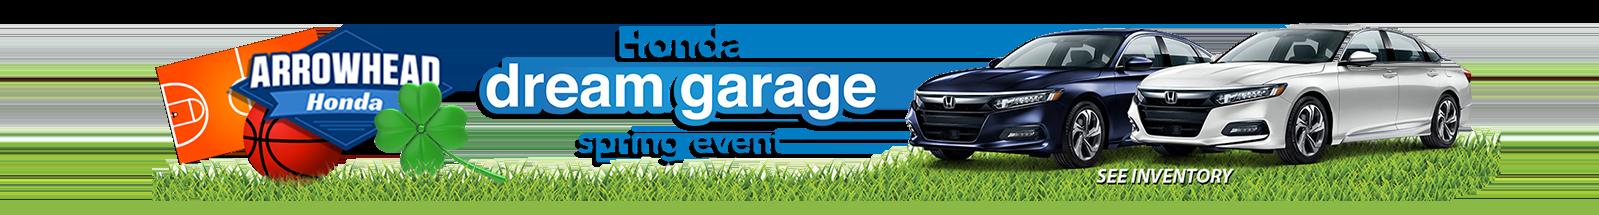 skinny-banner-garage-spring-grass